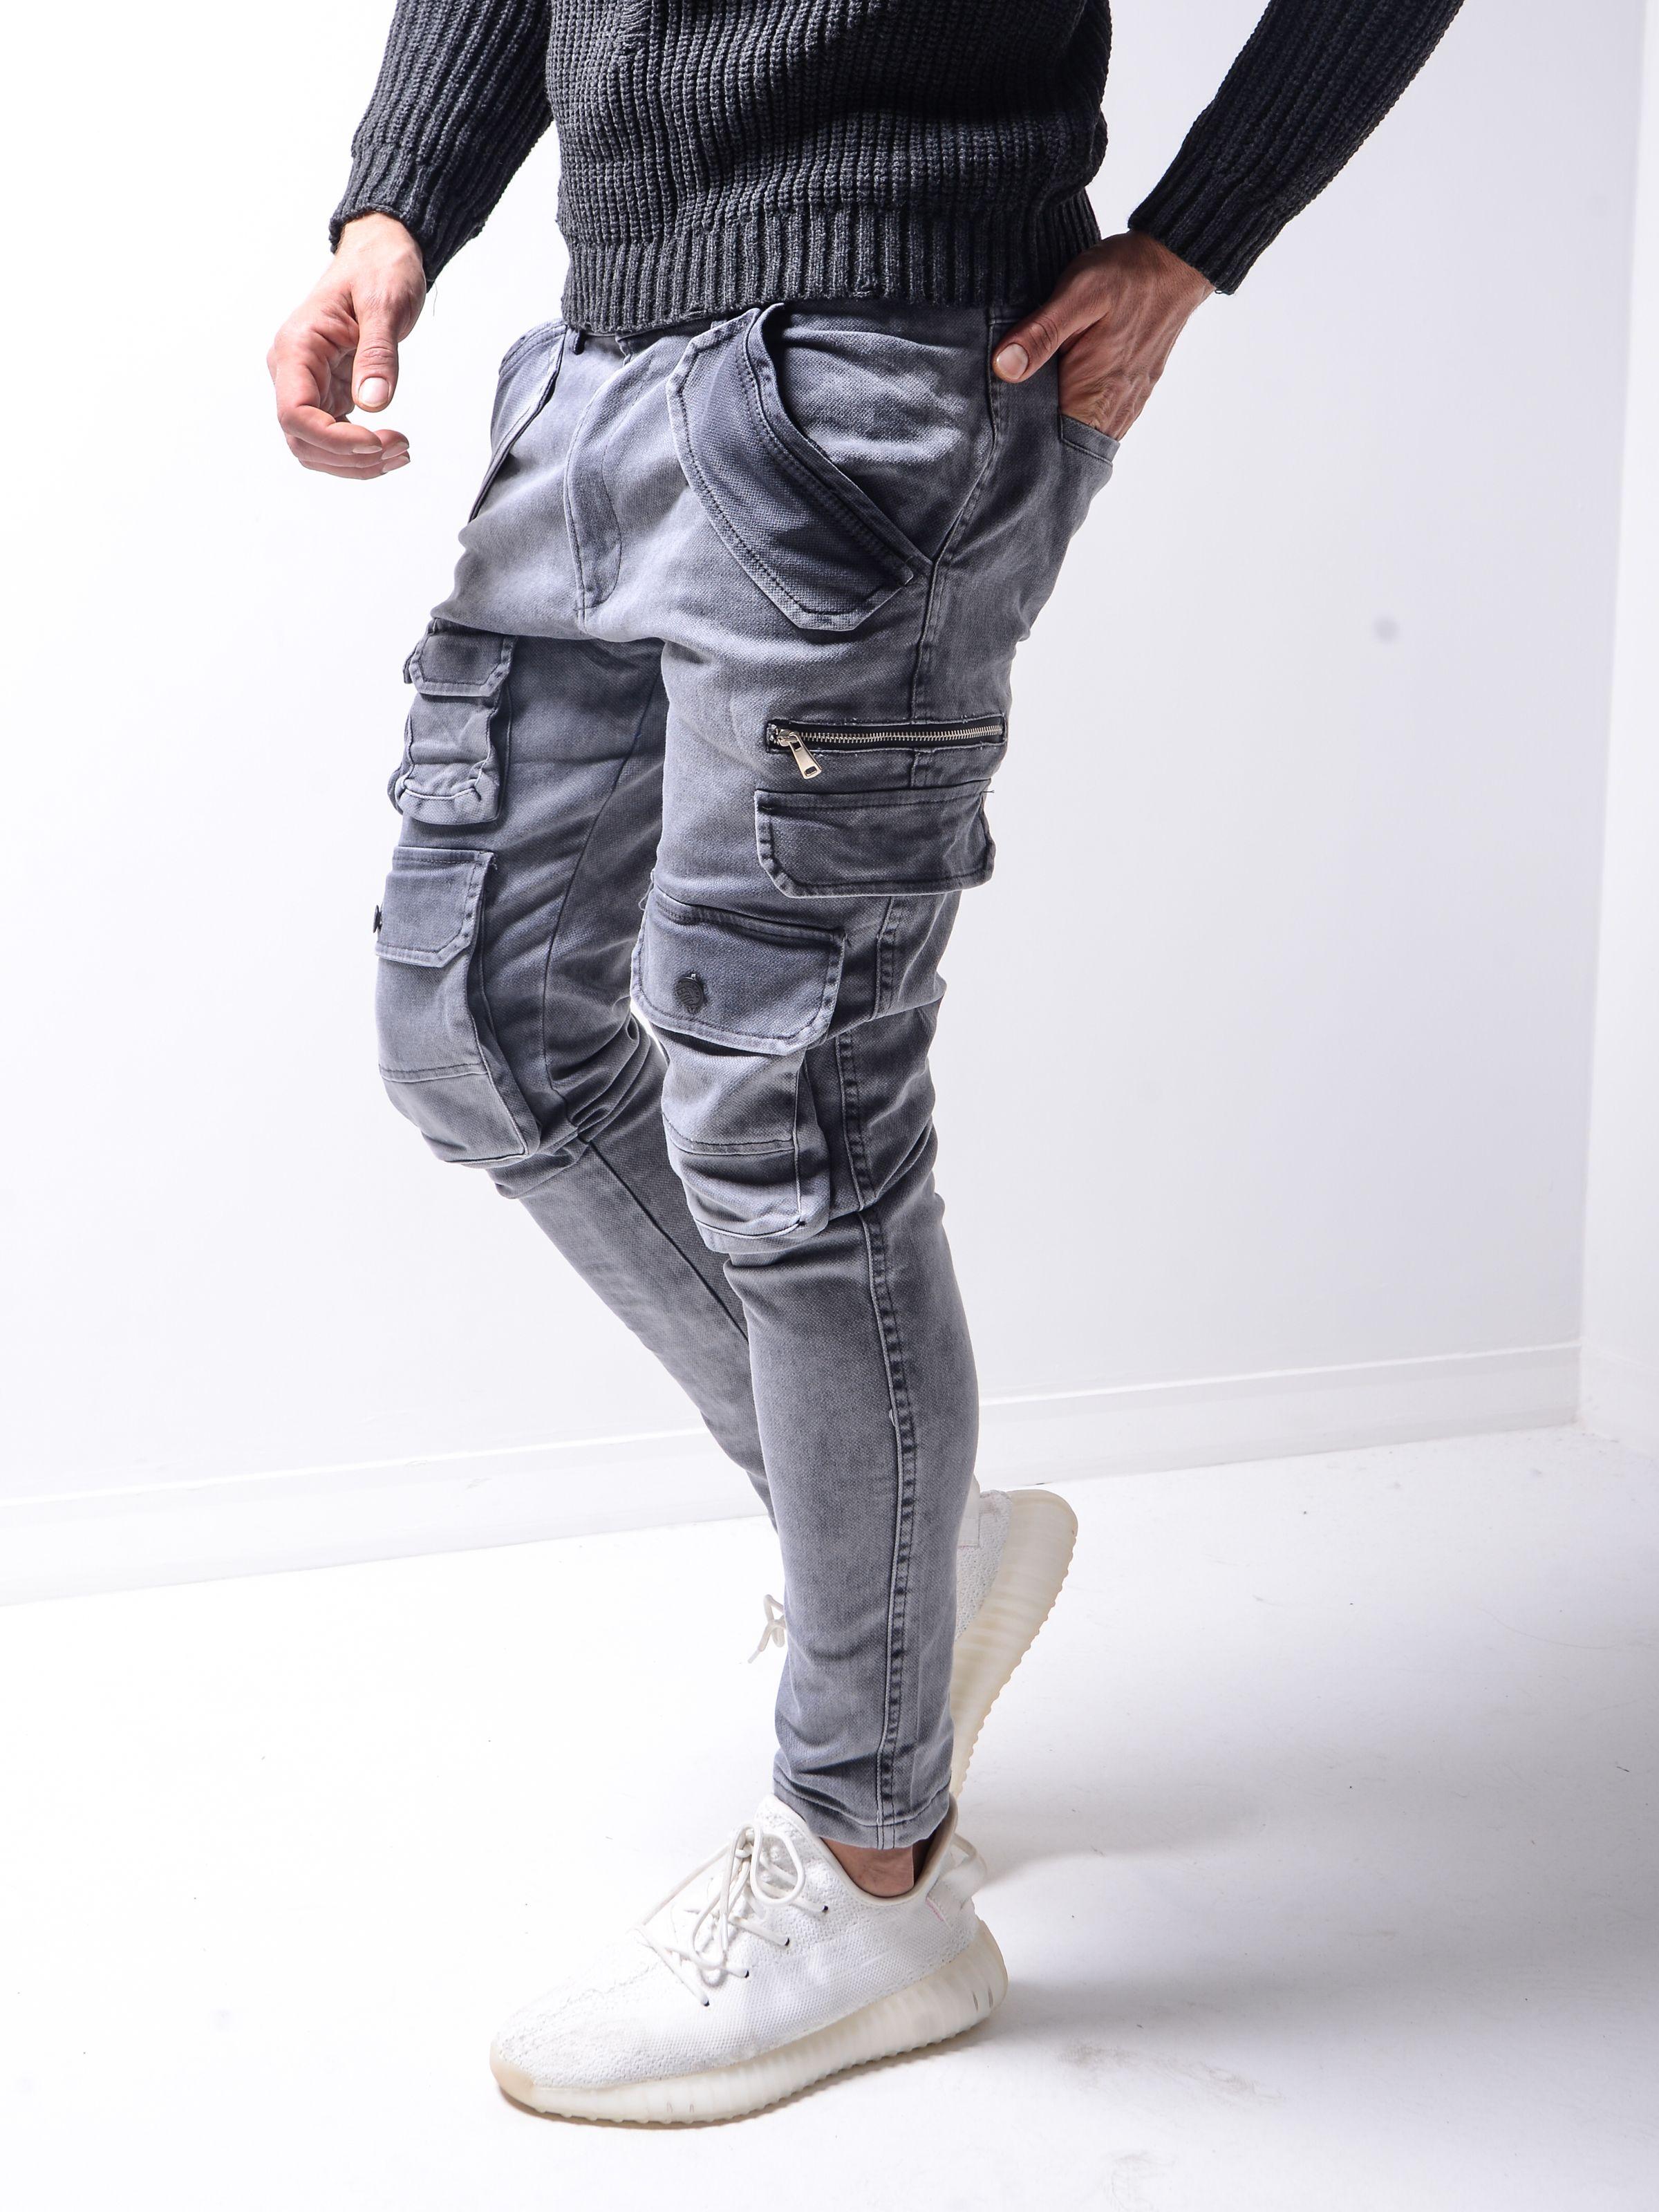 Fashion Menswear Outfits Denim Sweater Mens Men Shirt Hoodie Wear Style Fashstop Tracksuit Vans Conve Mens Street Style Shirt Outfit Men Denim Shirt With Jeans